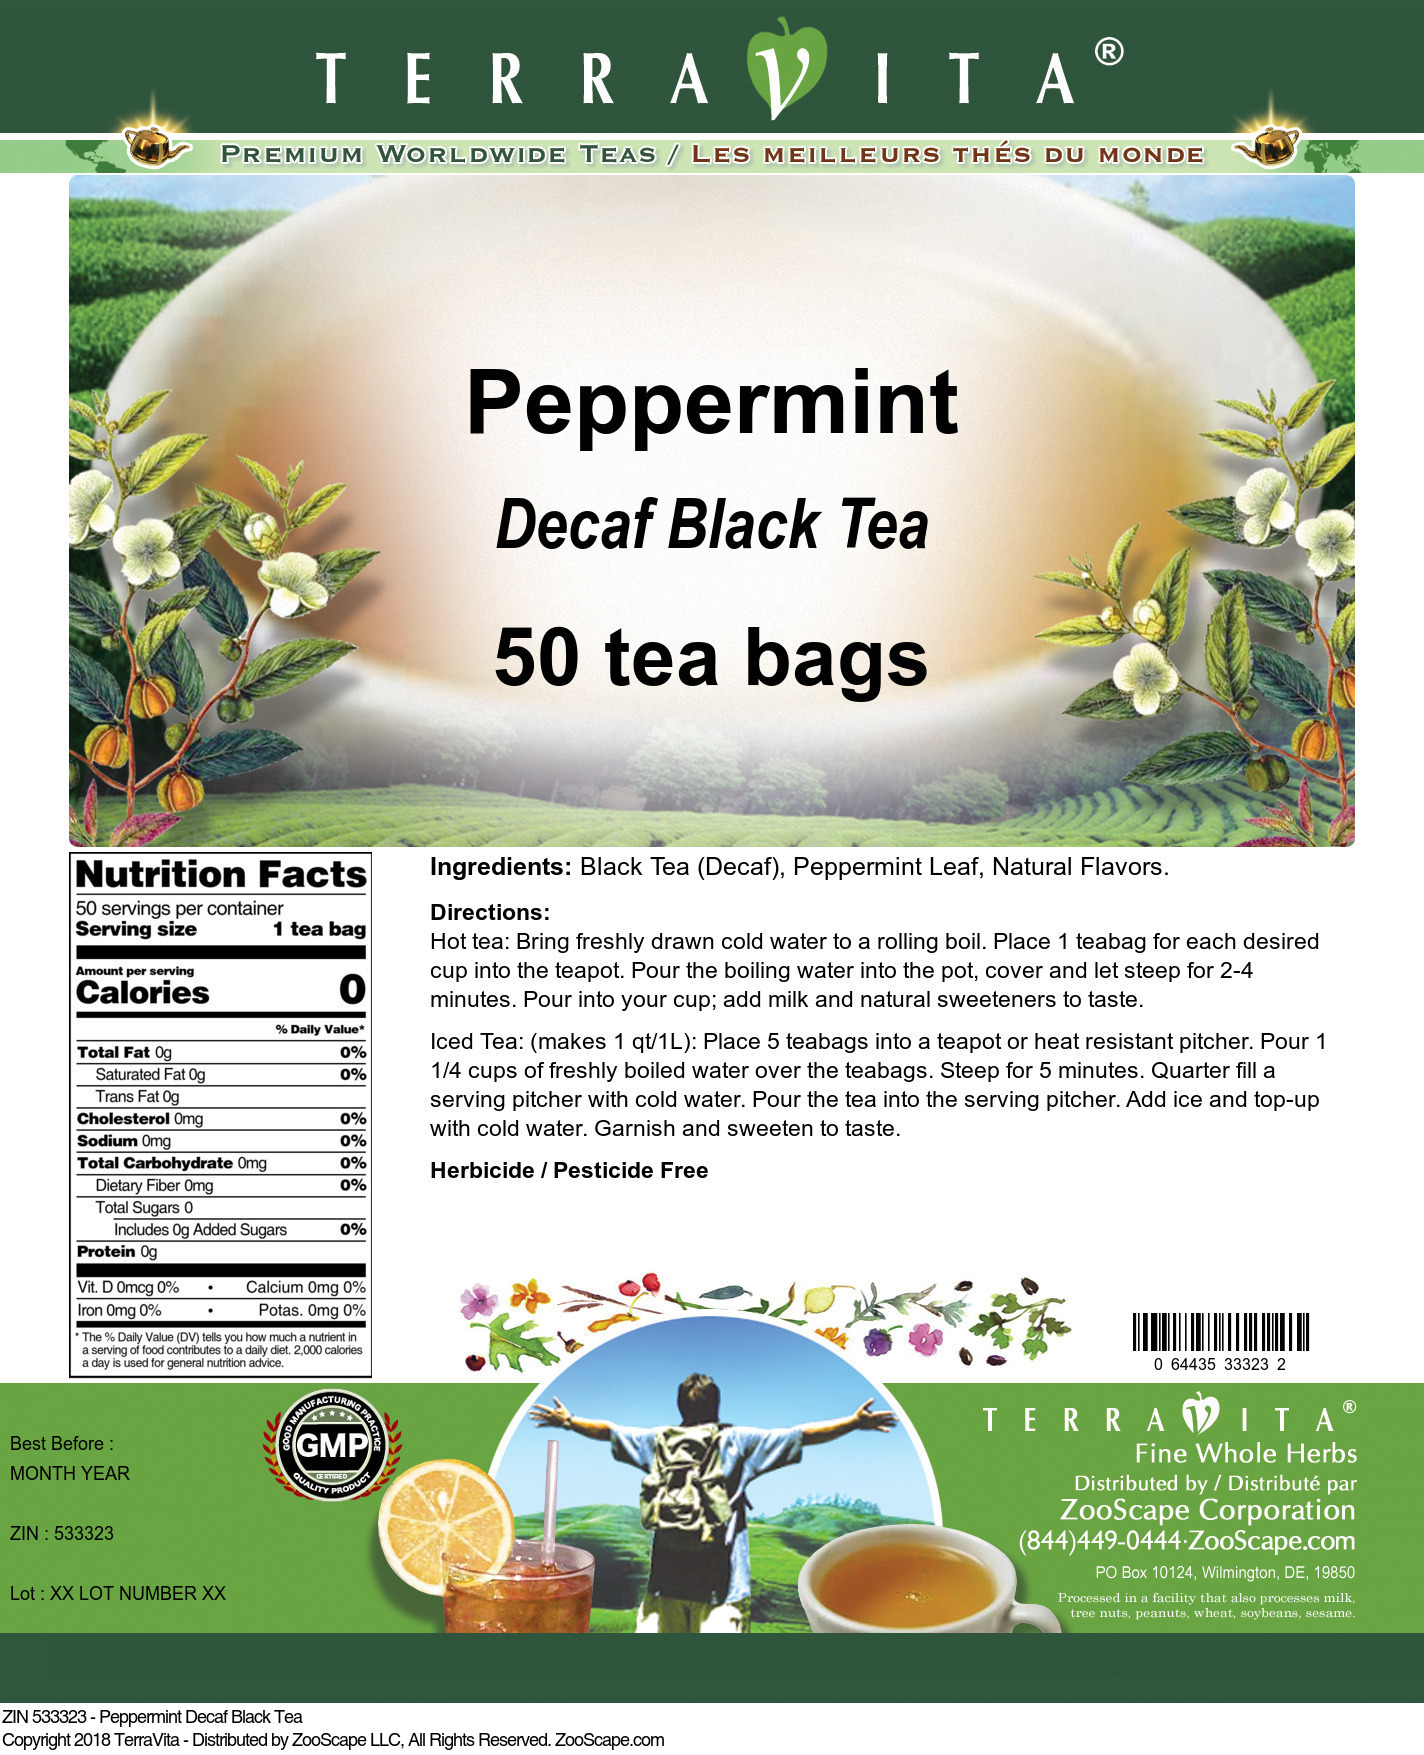 Peppermint Decaf Black Tea